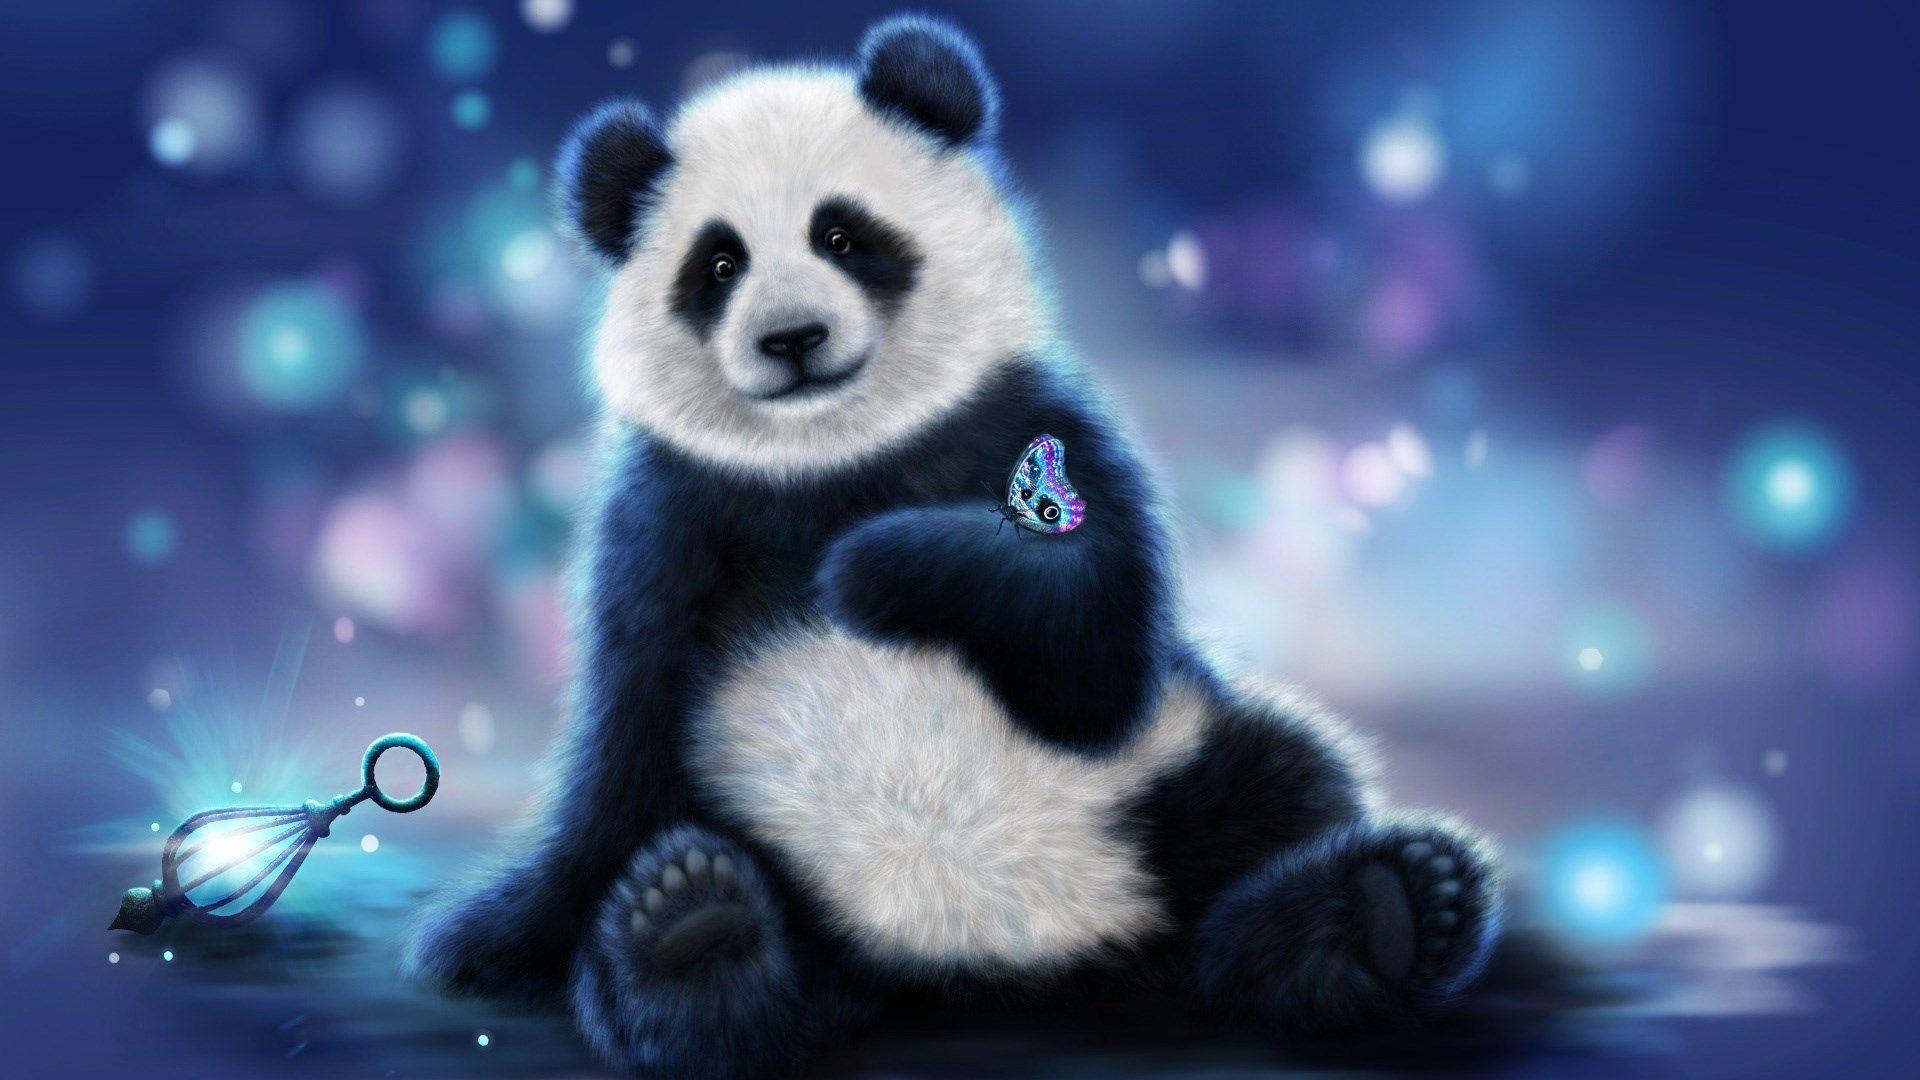 Cute Panda Images Hd Tumblr Free